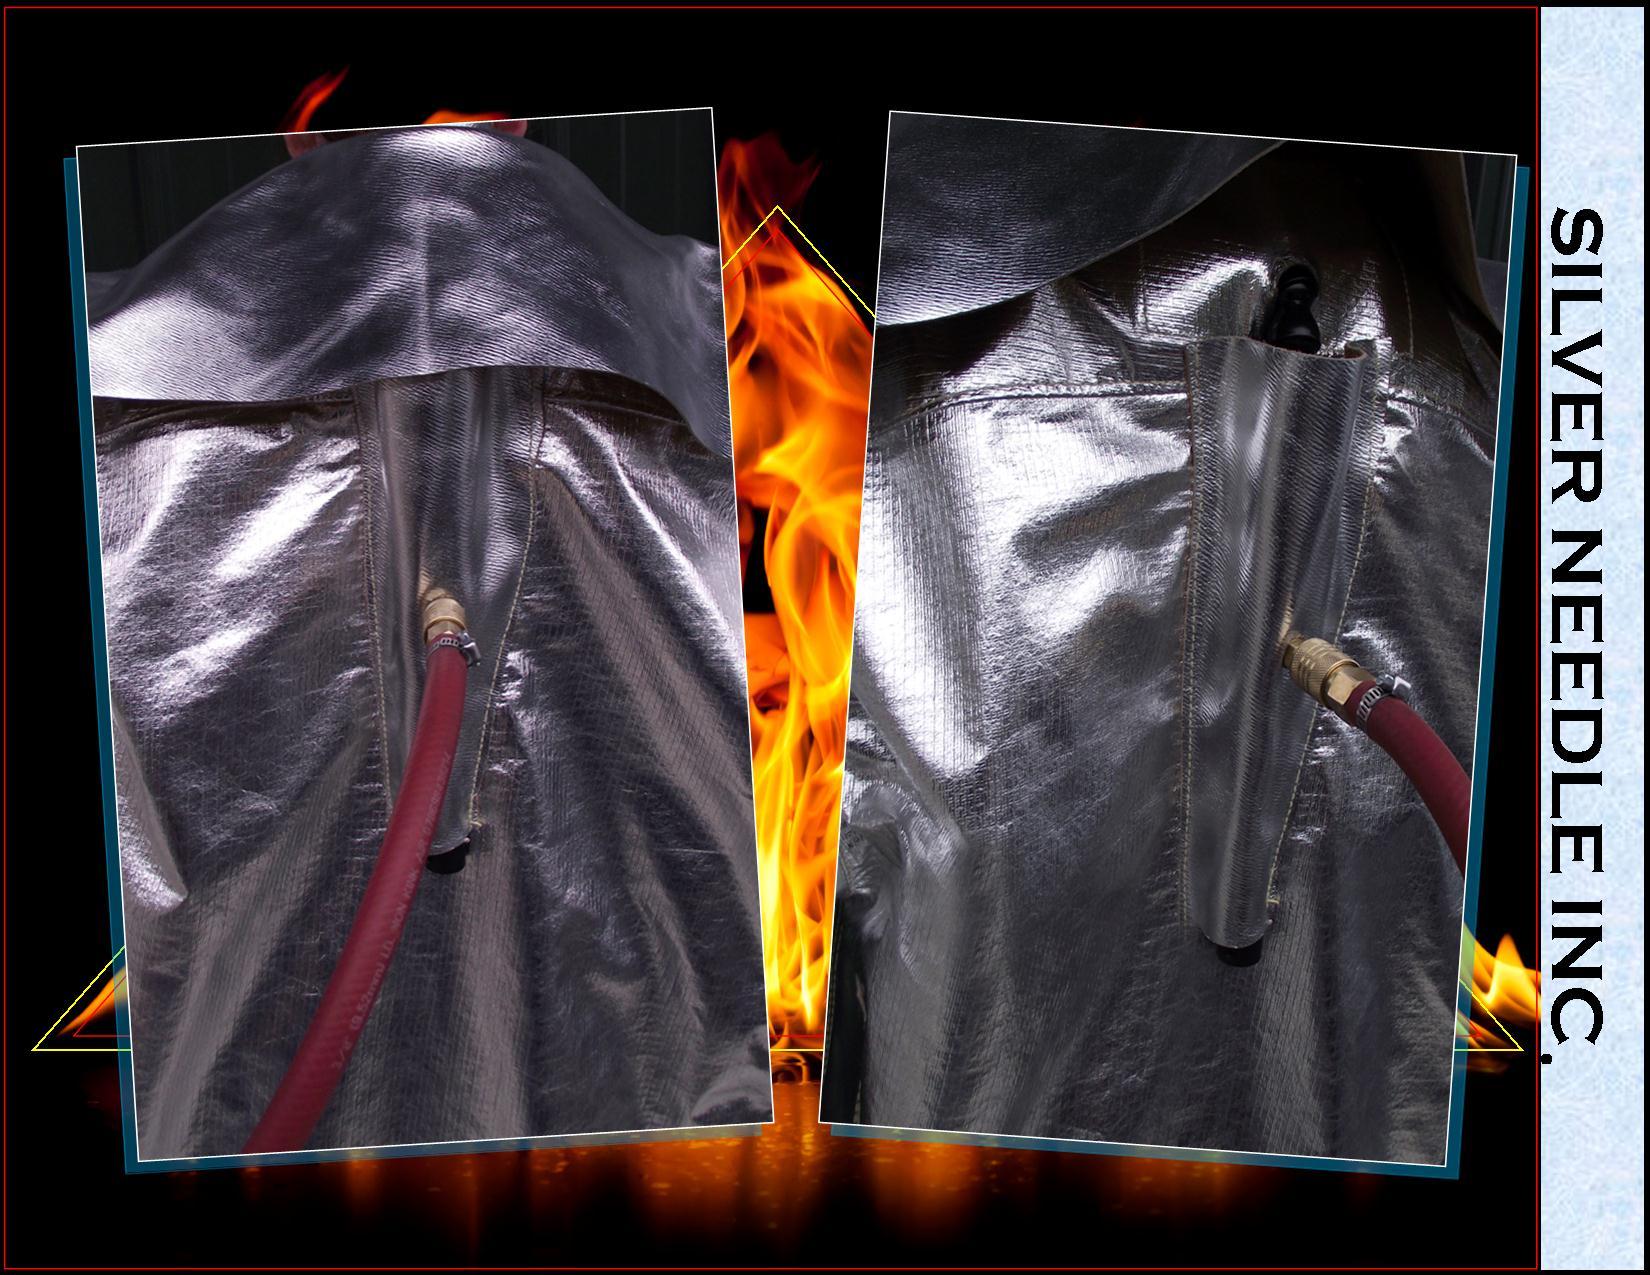 vortex-tube-air-cooled-coat.jpg